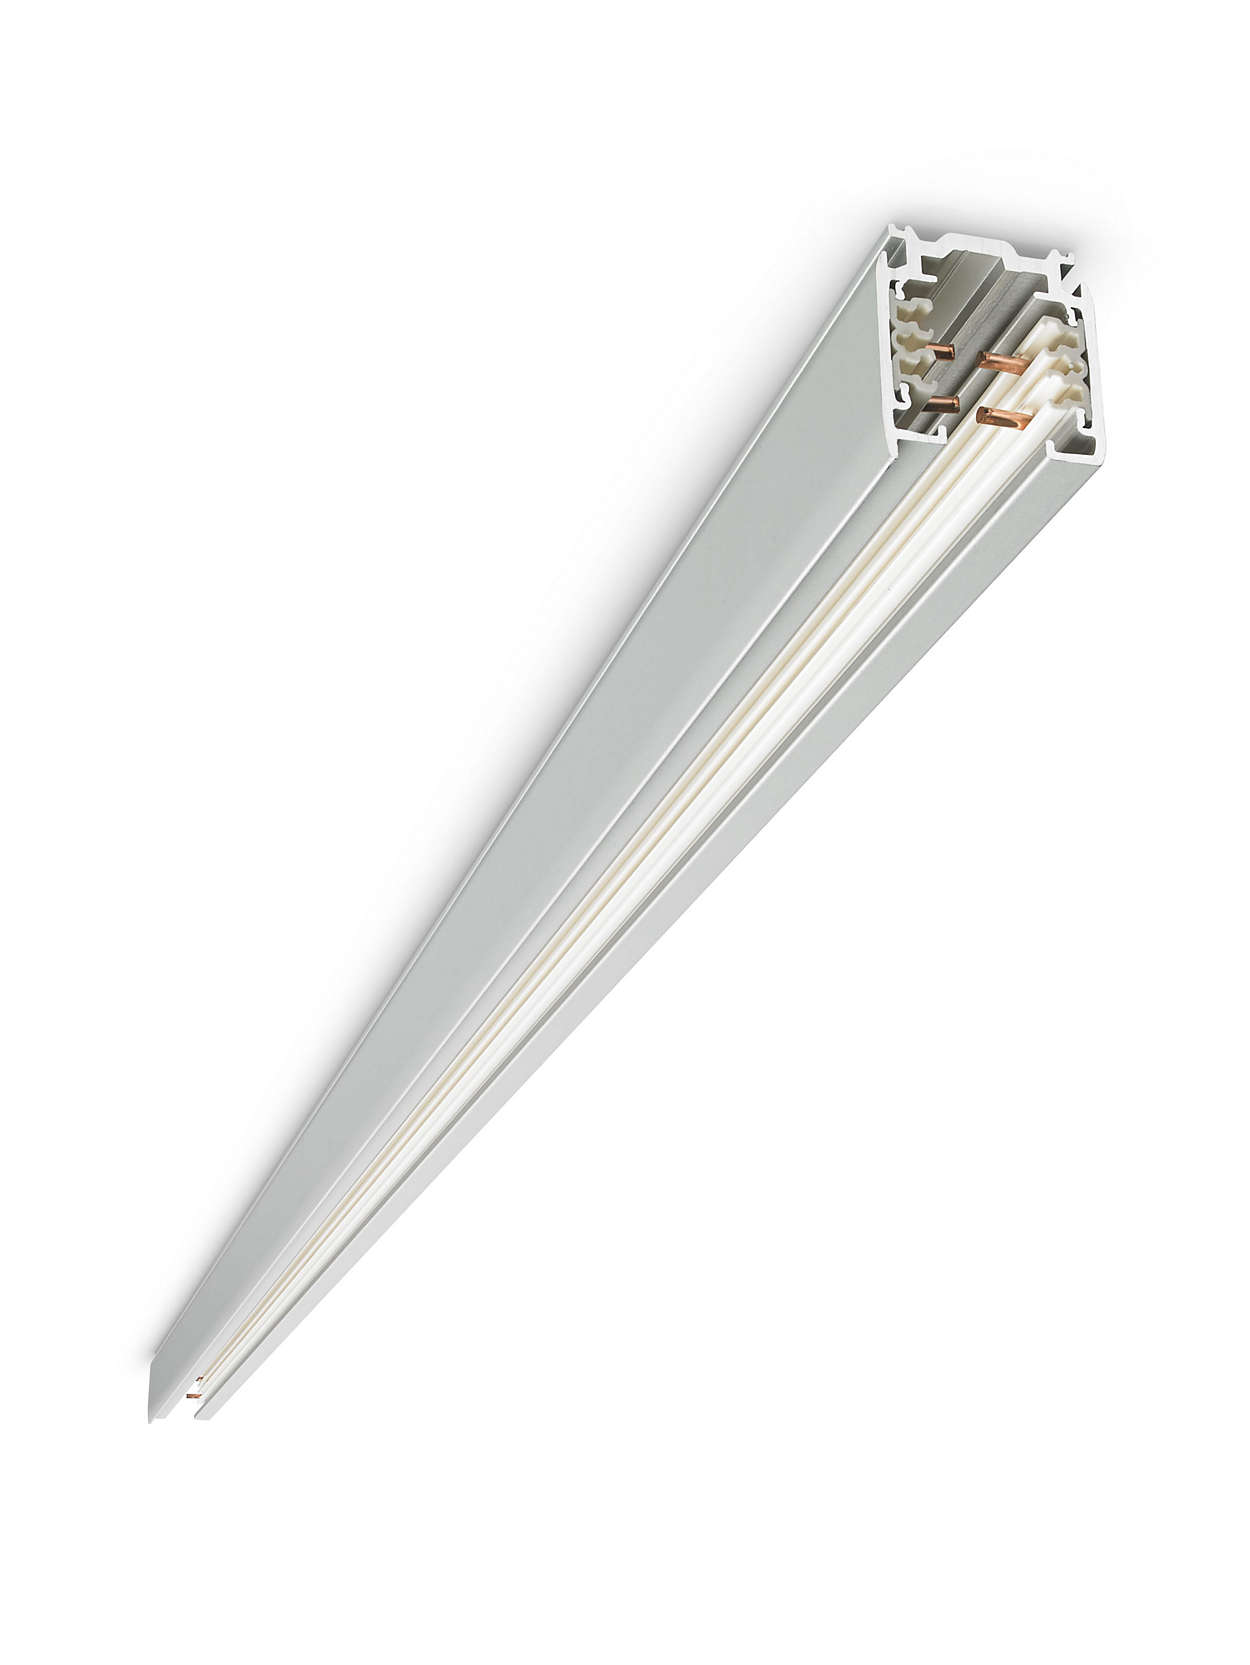 3-krets, firkantet RCS750